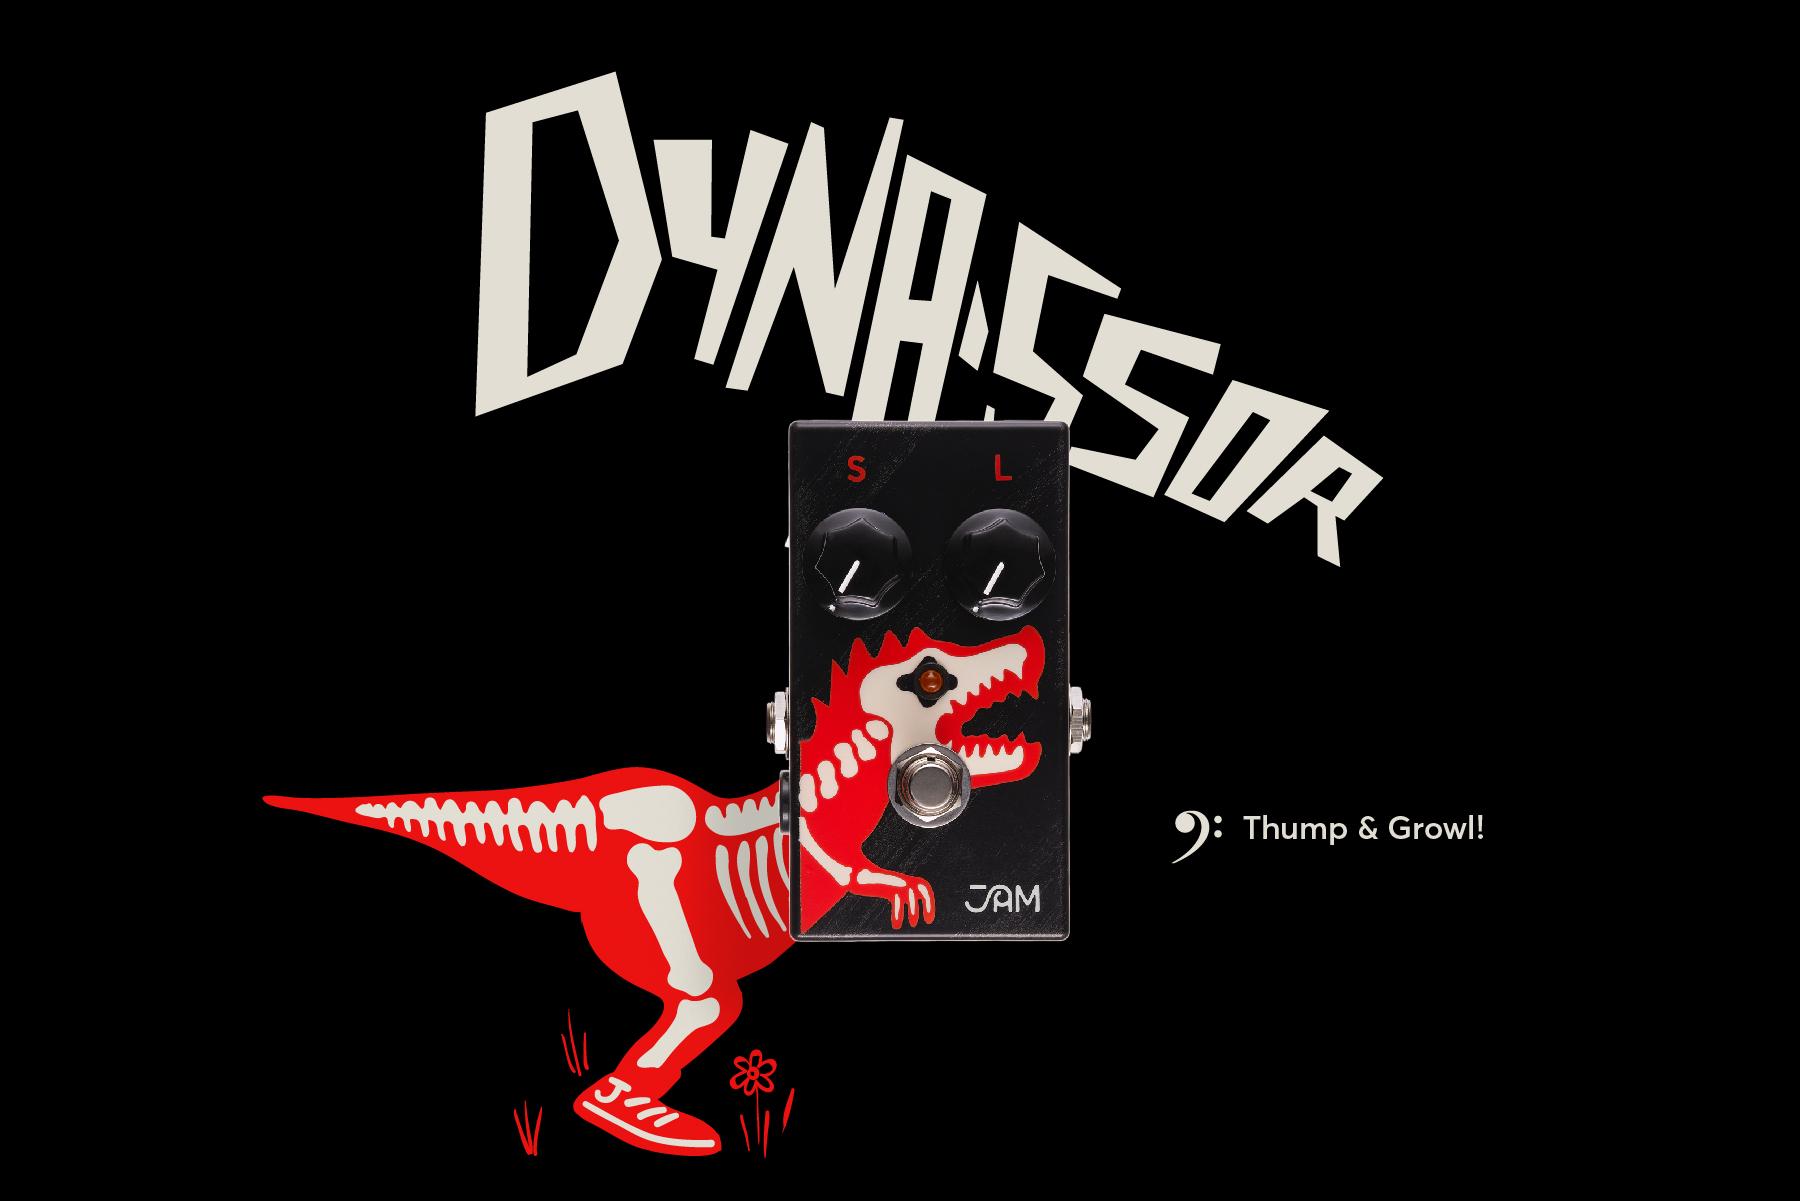 Dyna-ssoR Bass